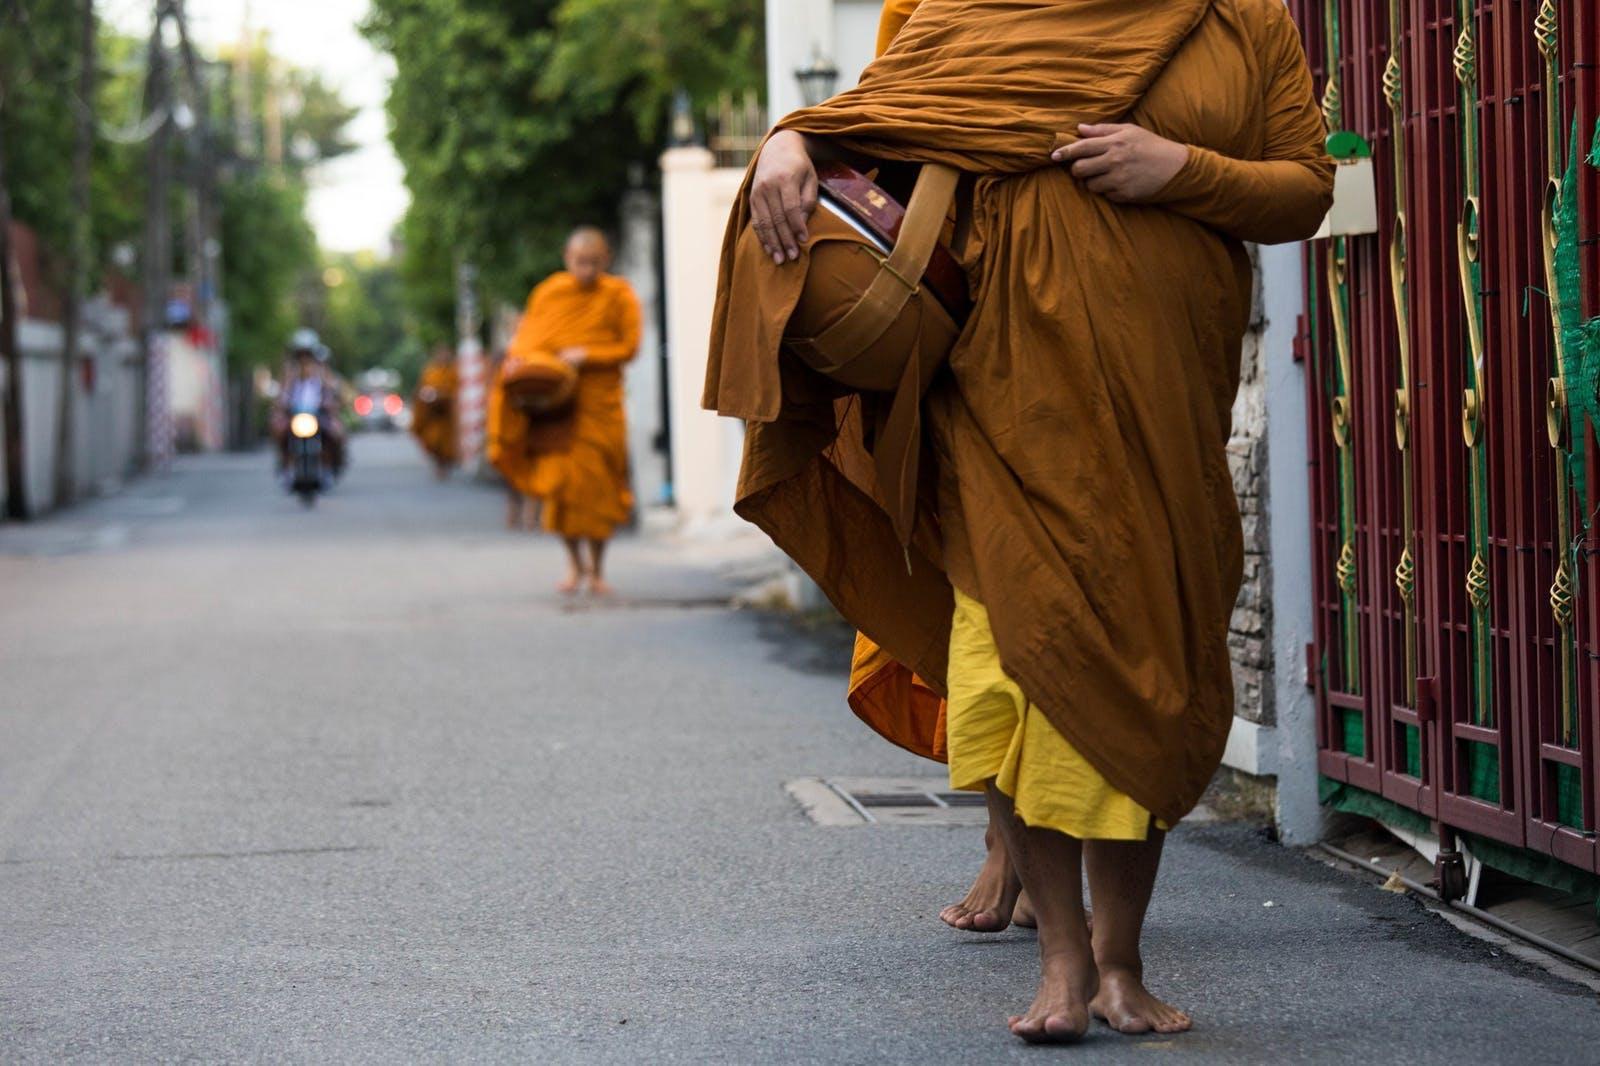 Fetmaepidemi bland munkar i Thailand